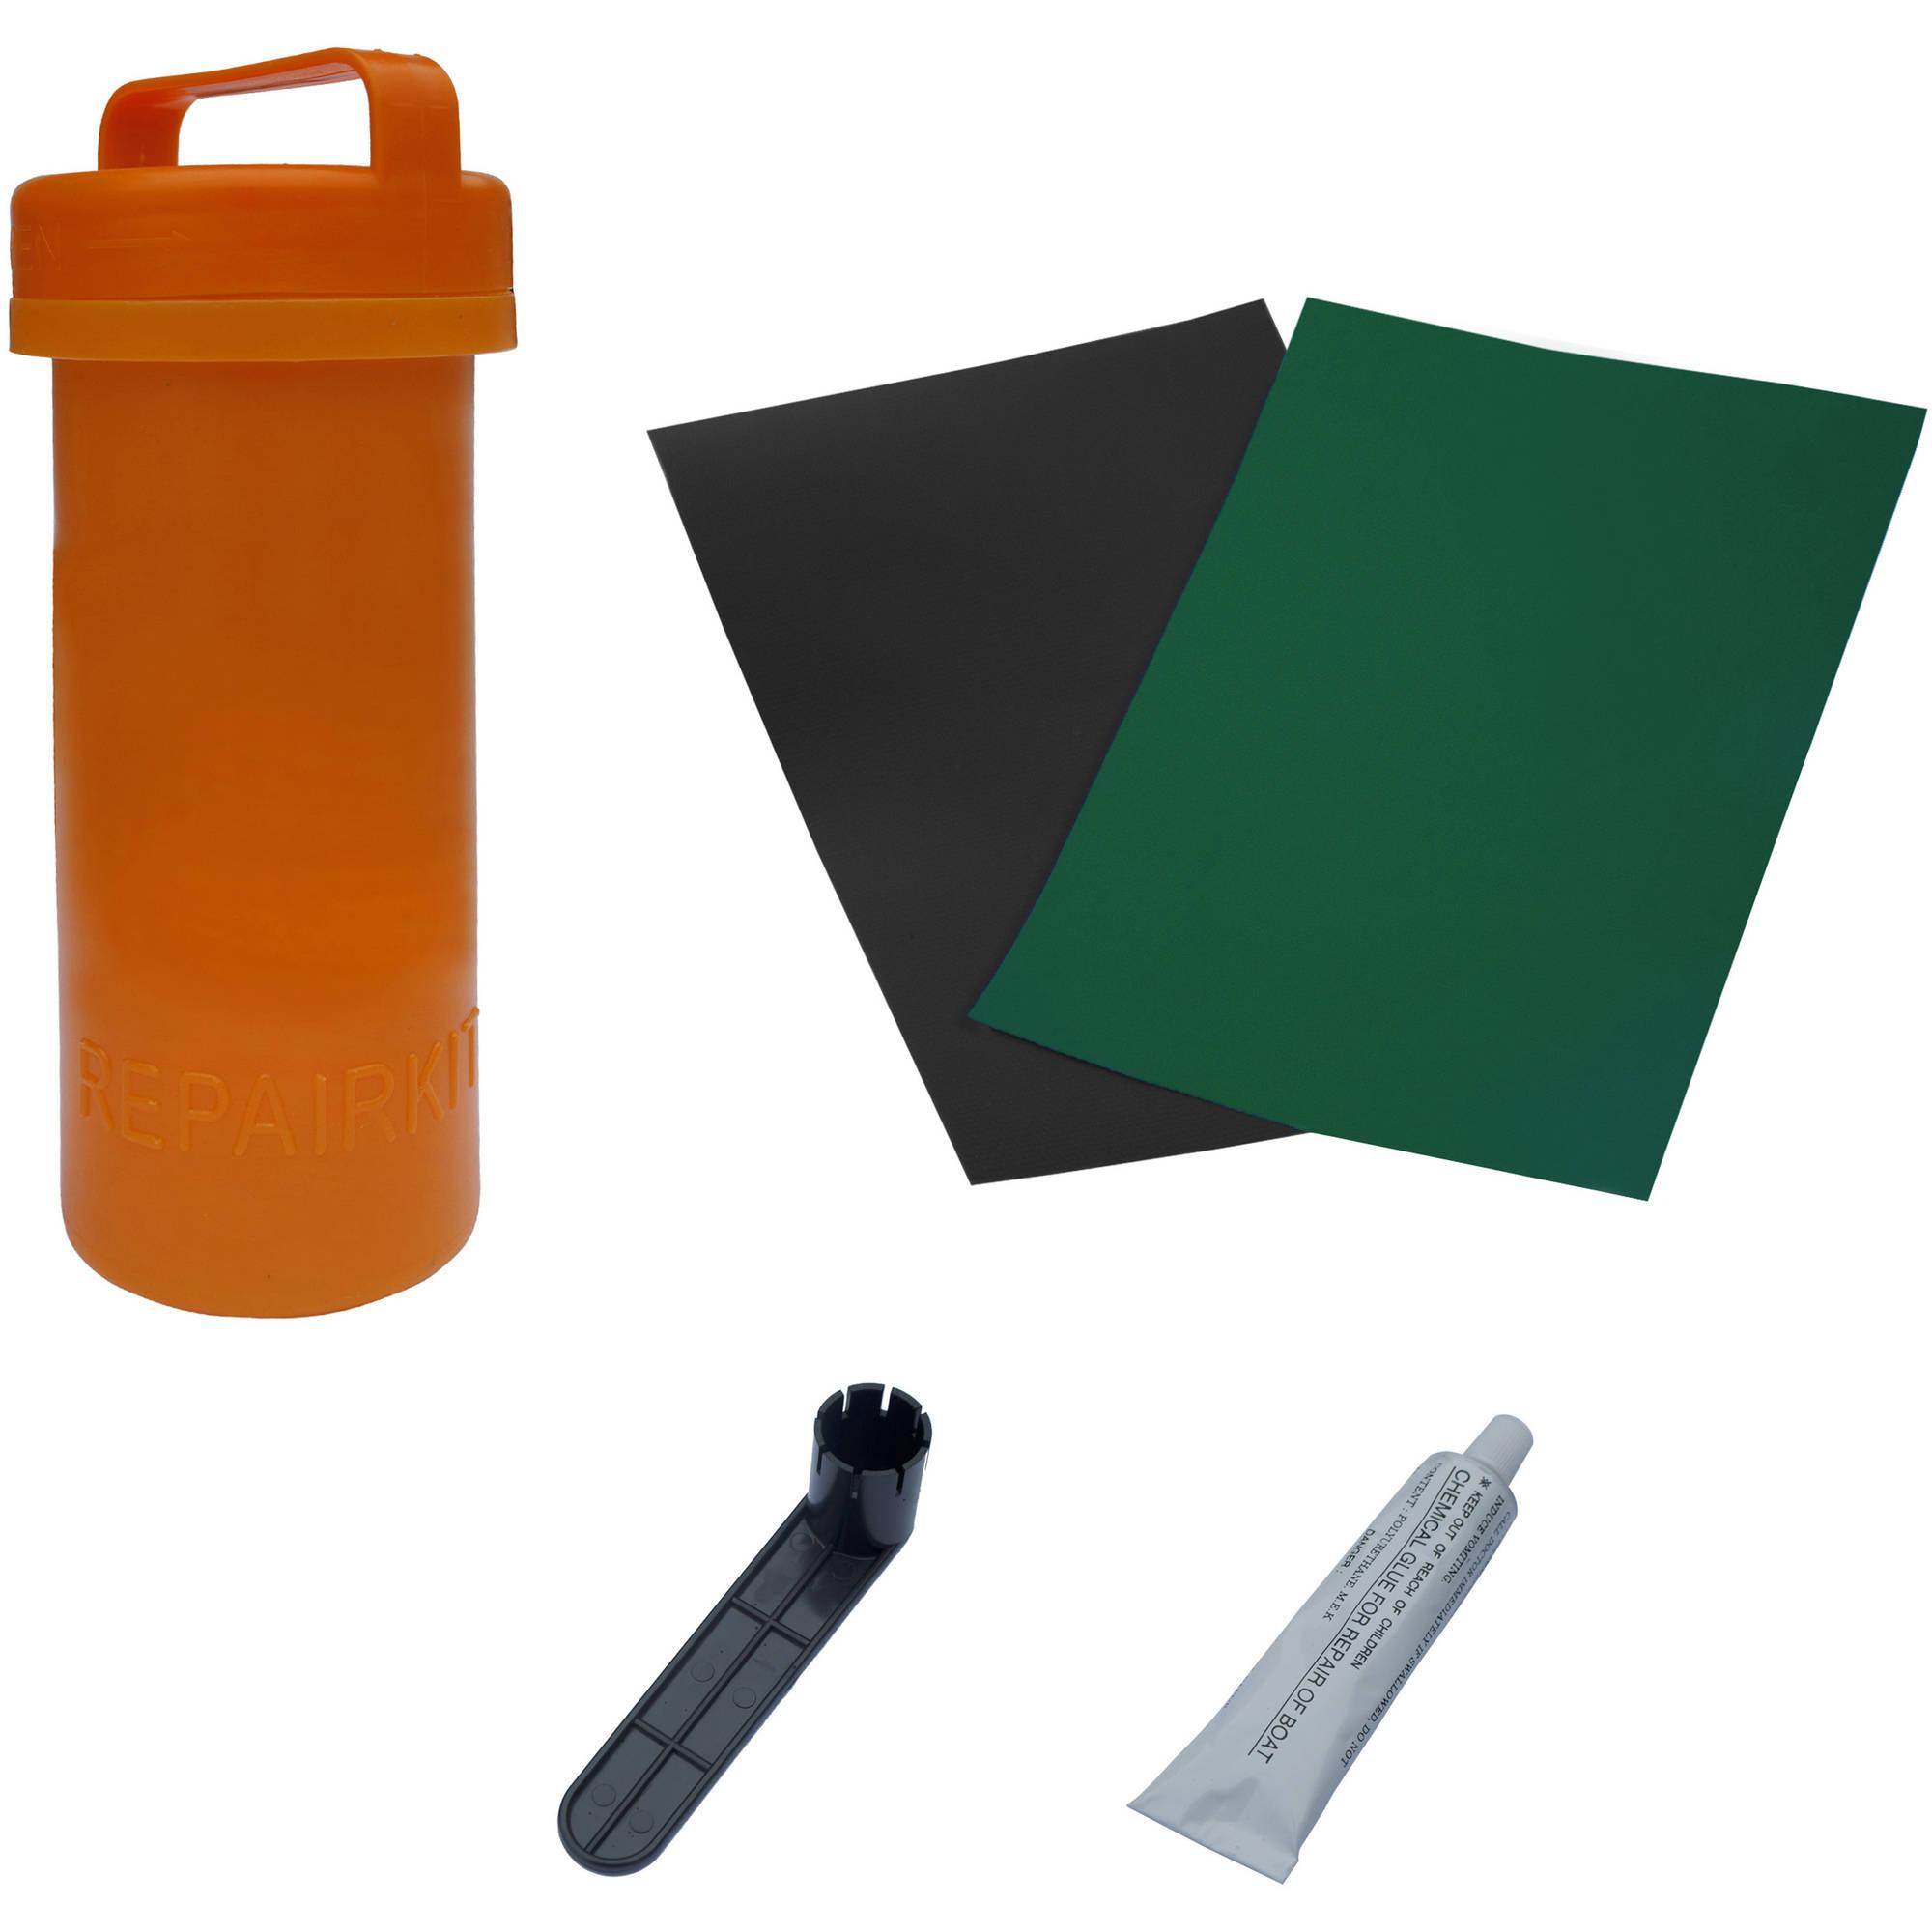 ALEKO Complete Essentials Repair Kit for Inflatable Boat - Dark Green